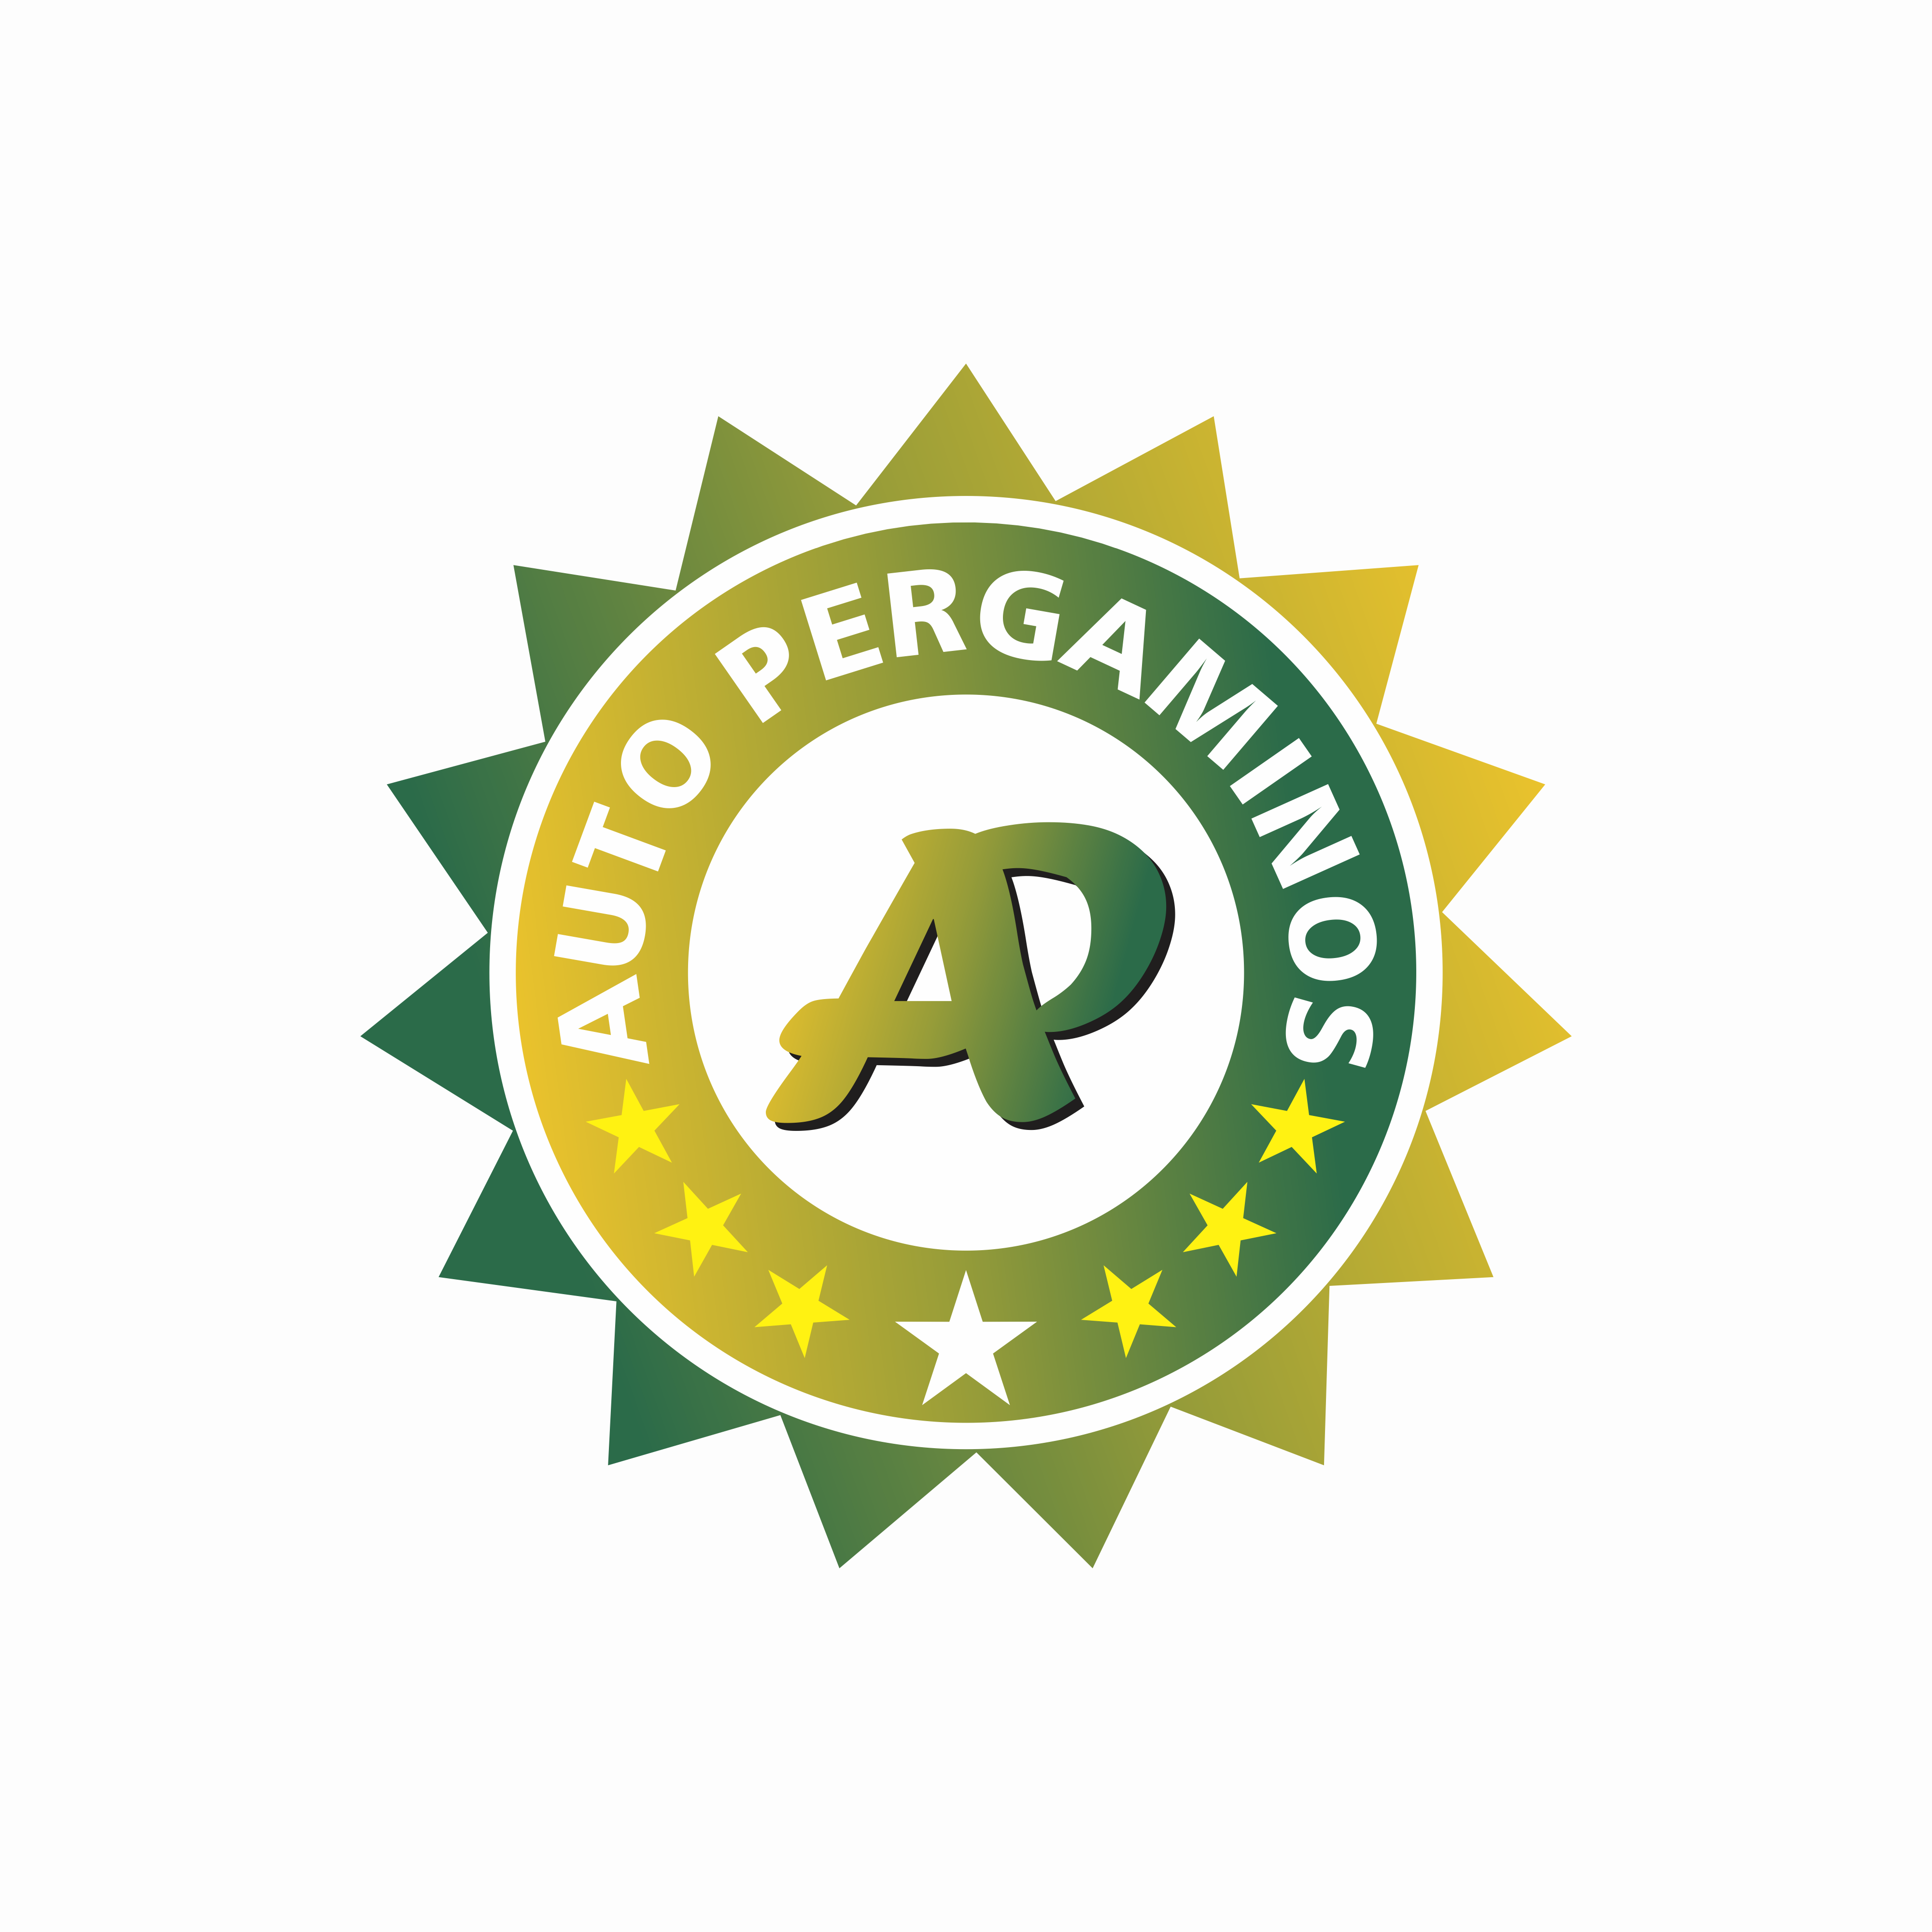 Masculine Modern Automotive Logo Design For Auto Pergaminos By Logos Expert Design 22128746